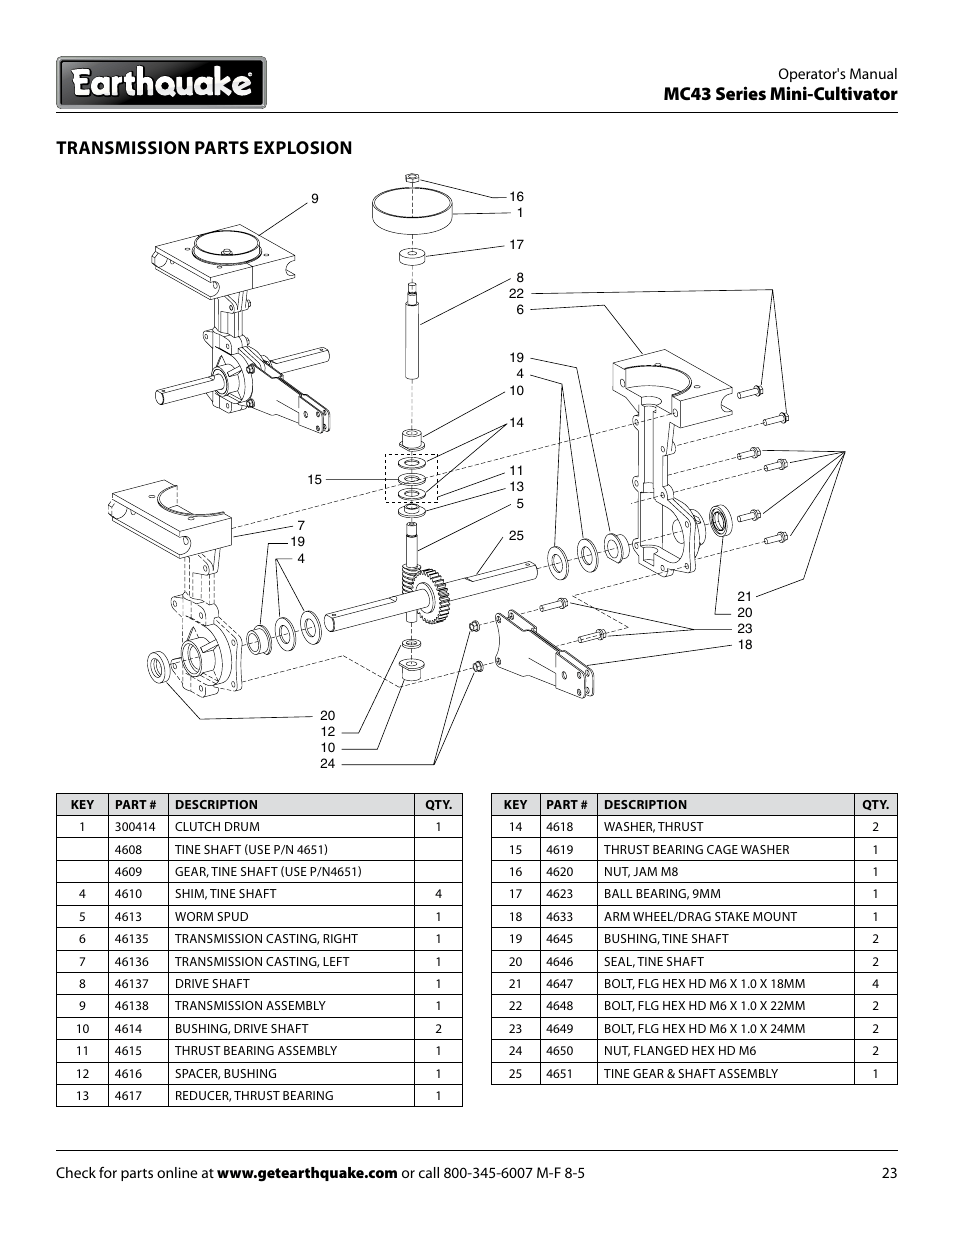 medium resolution of mc43 series mini cultivator transmission parts explosion earthquake mc43e user manual page 23 32